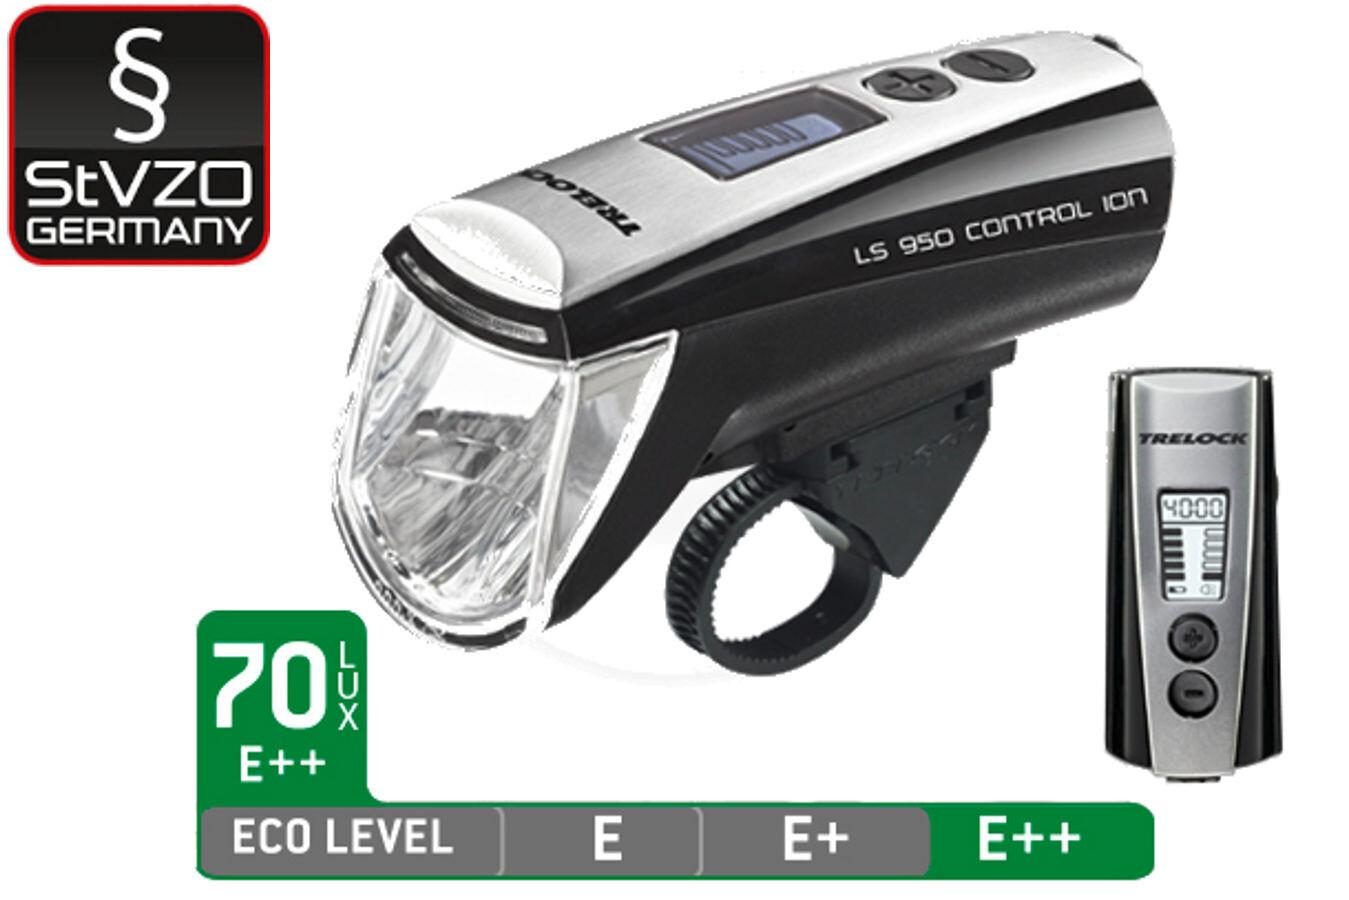 45h Akku Trelock LS 950 ION Control 720 Reego Fahrrad-Lampenset bis 70 Lux